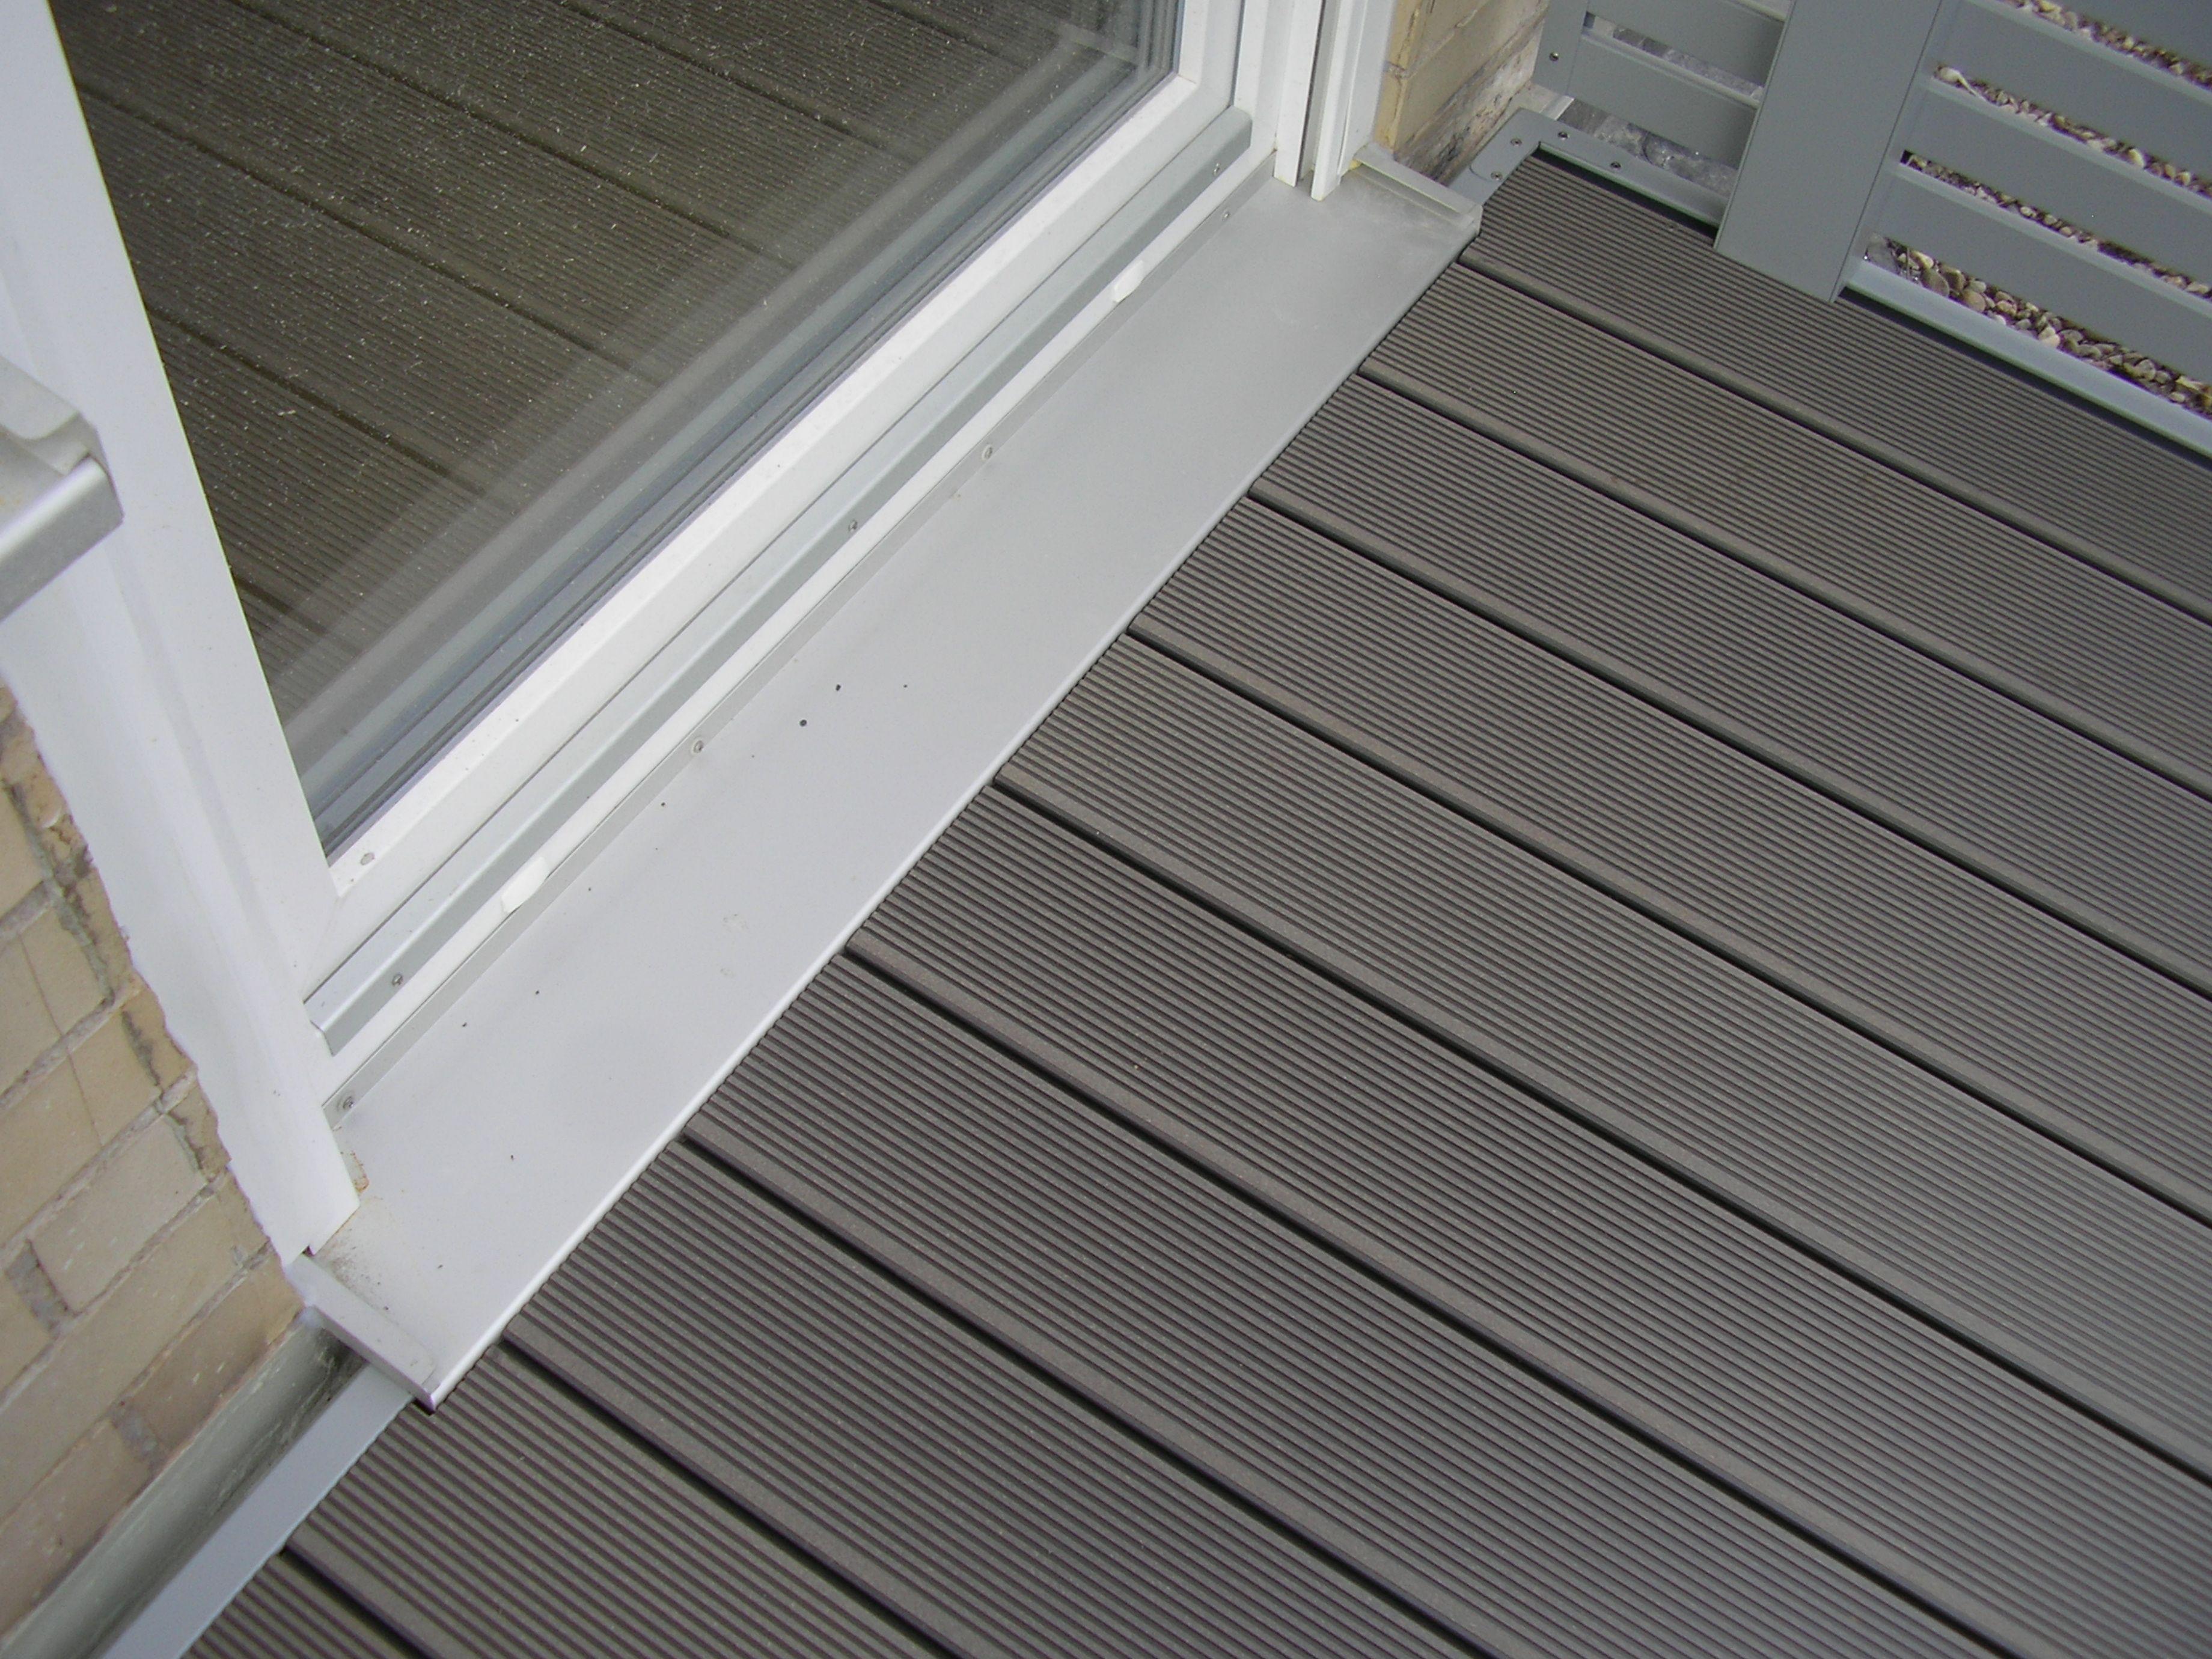 Wpc Boden Turausschnitt Leeb Balkonboden In 2019 Wpc Boden Boden Und Balkon